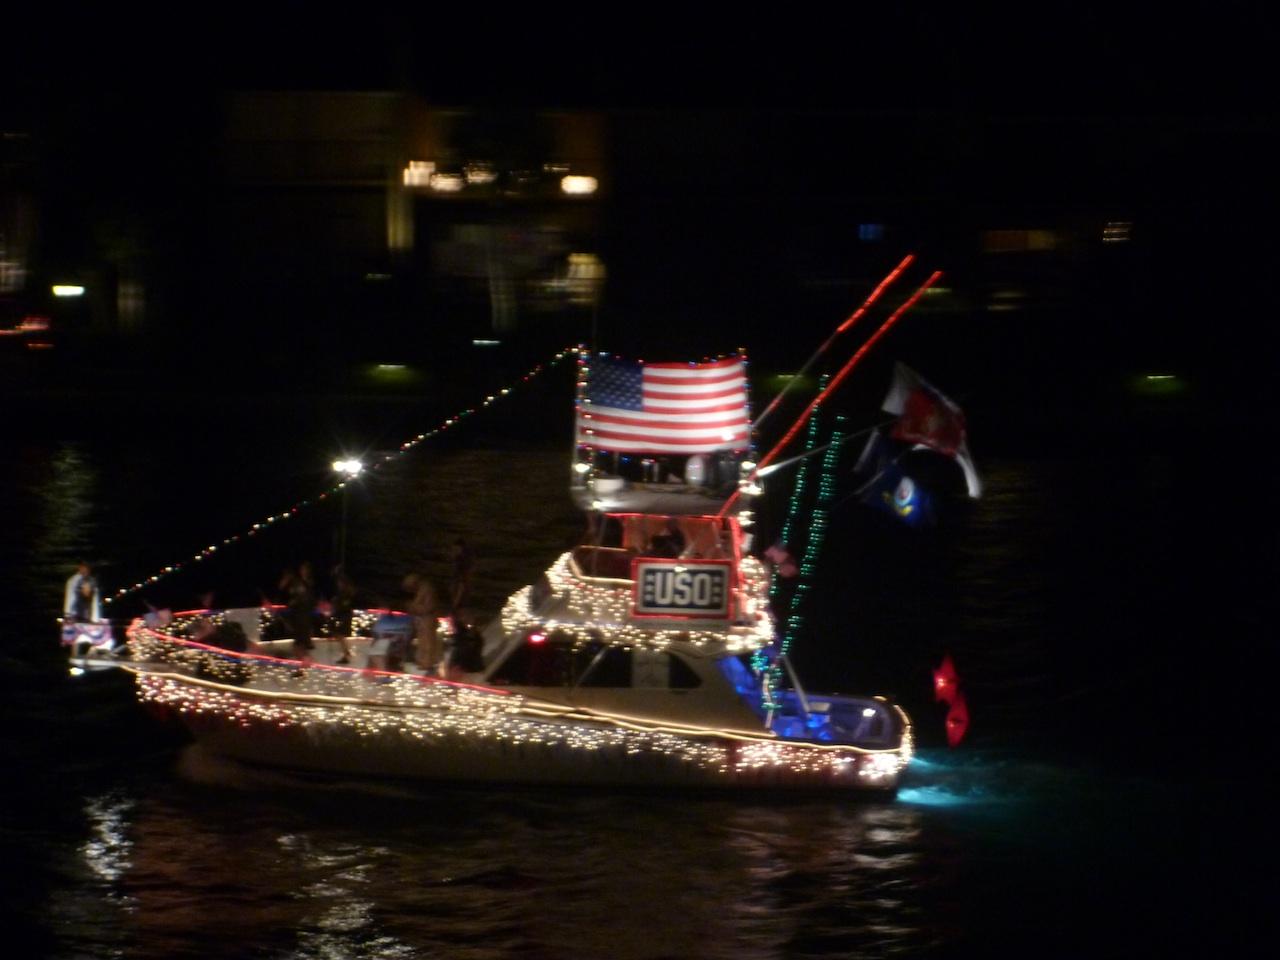 The USO Boat